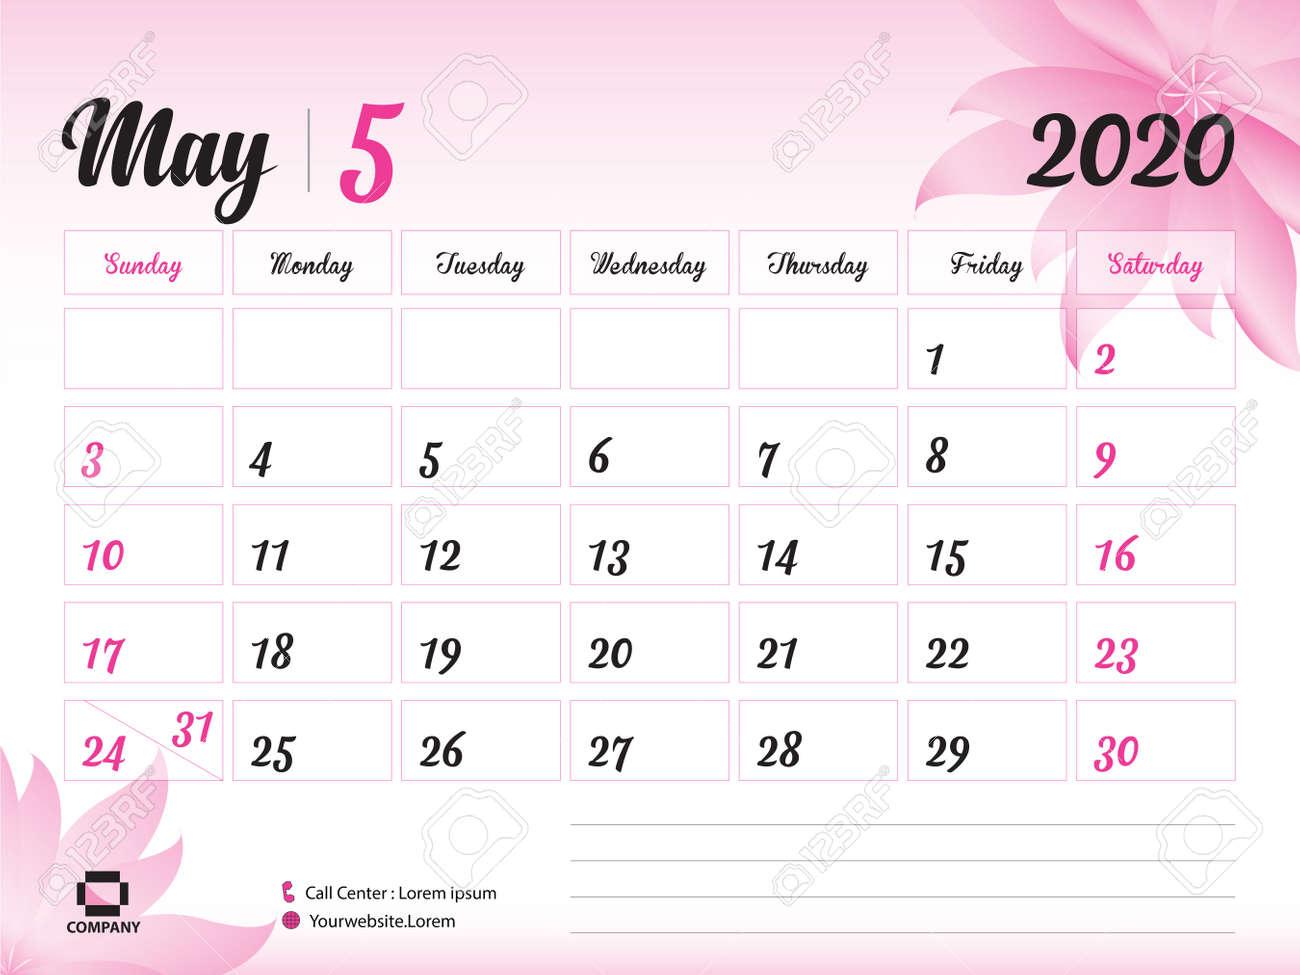 May Printable Calendar 2020.May 2020 Year Template Calendar 2020 Desk Calendar Design